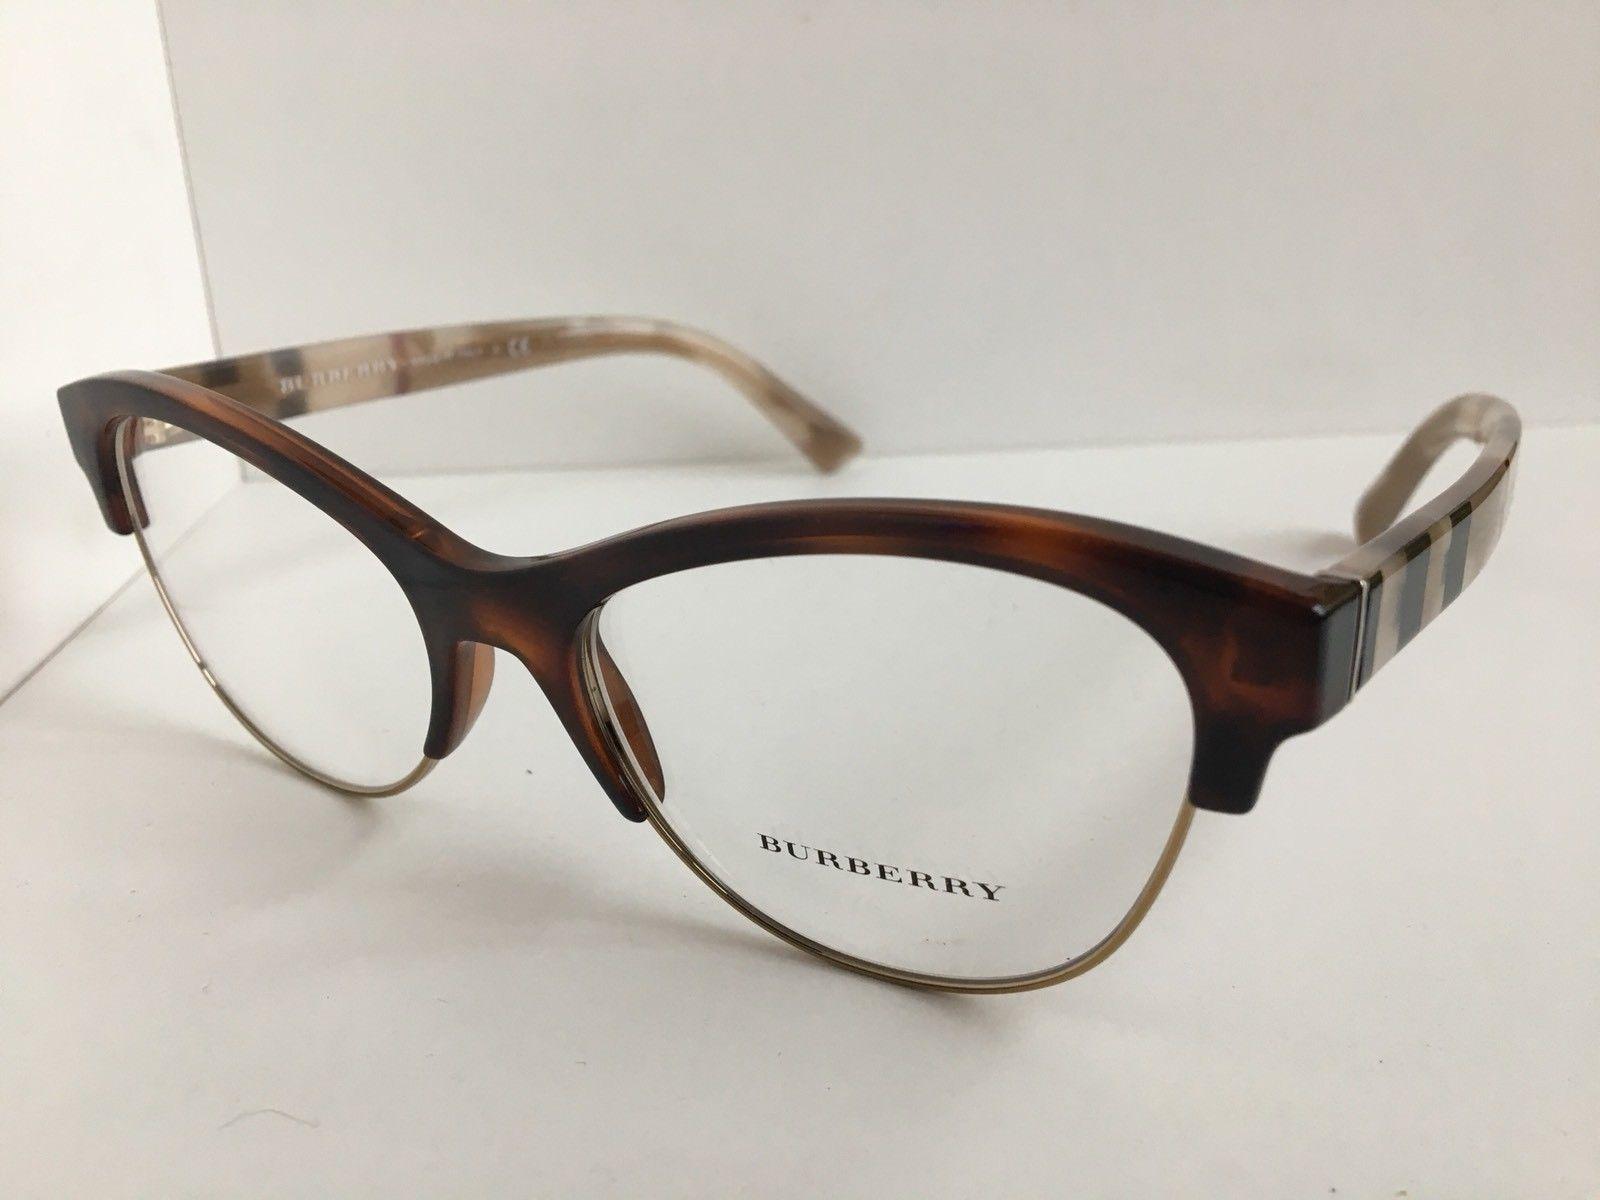 90b207c04978 New BURBERRY B 2235 3601 53mm Brown Cats Eye Rx Women Eyeglasses Frame